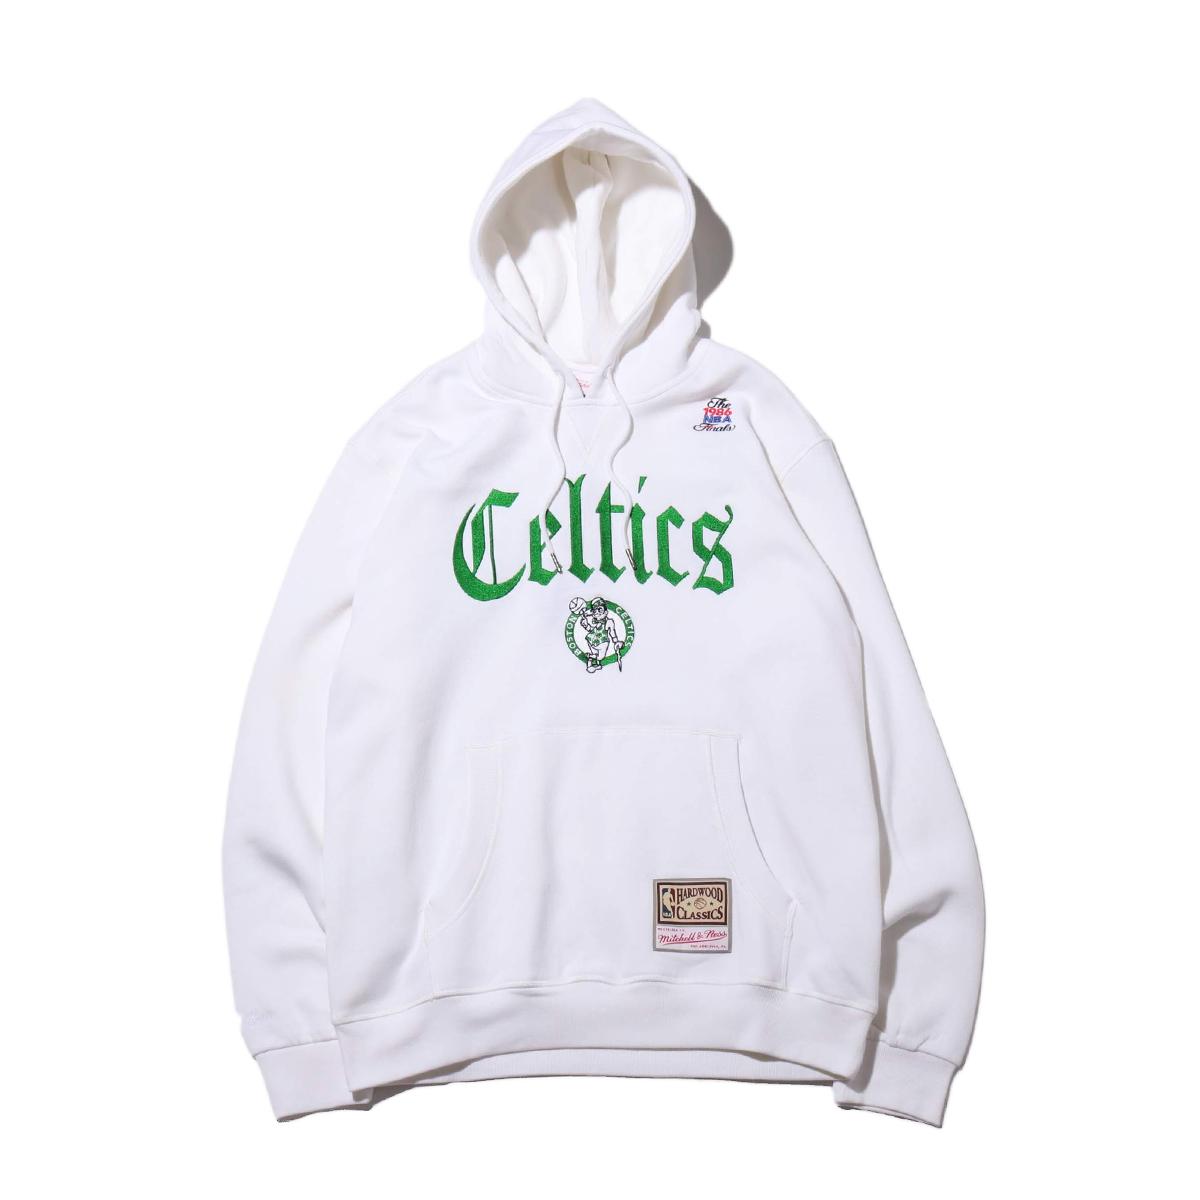 Mitchell & Ness Old English Hoodie - B.Celtics(ミッチェルアンドネス オールドイングリッシュ)WHITE【メンズ パーカー】19FW-I